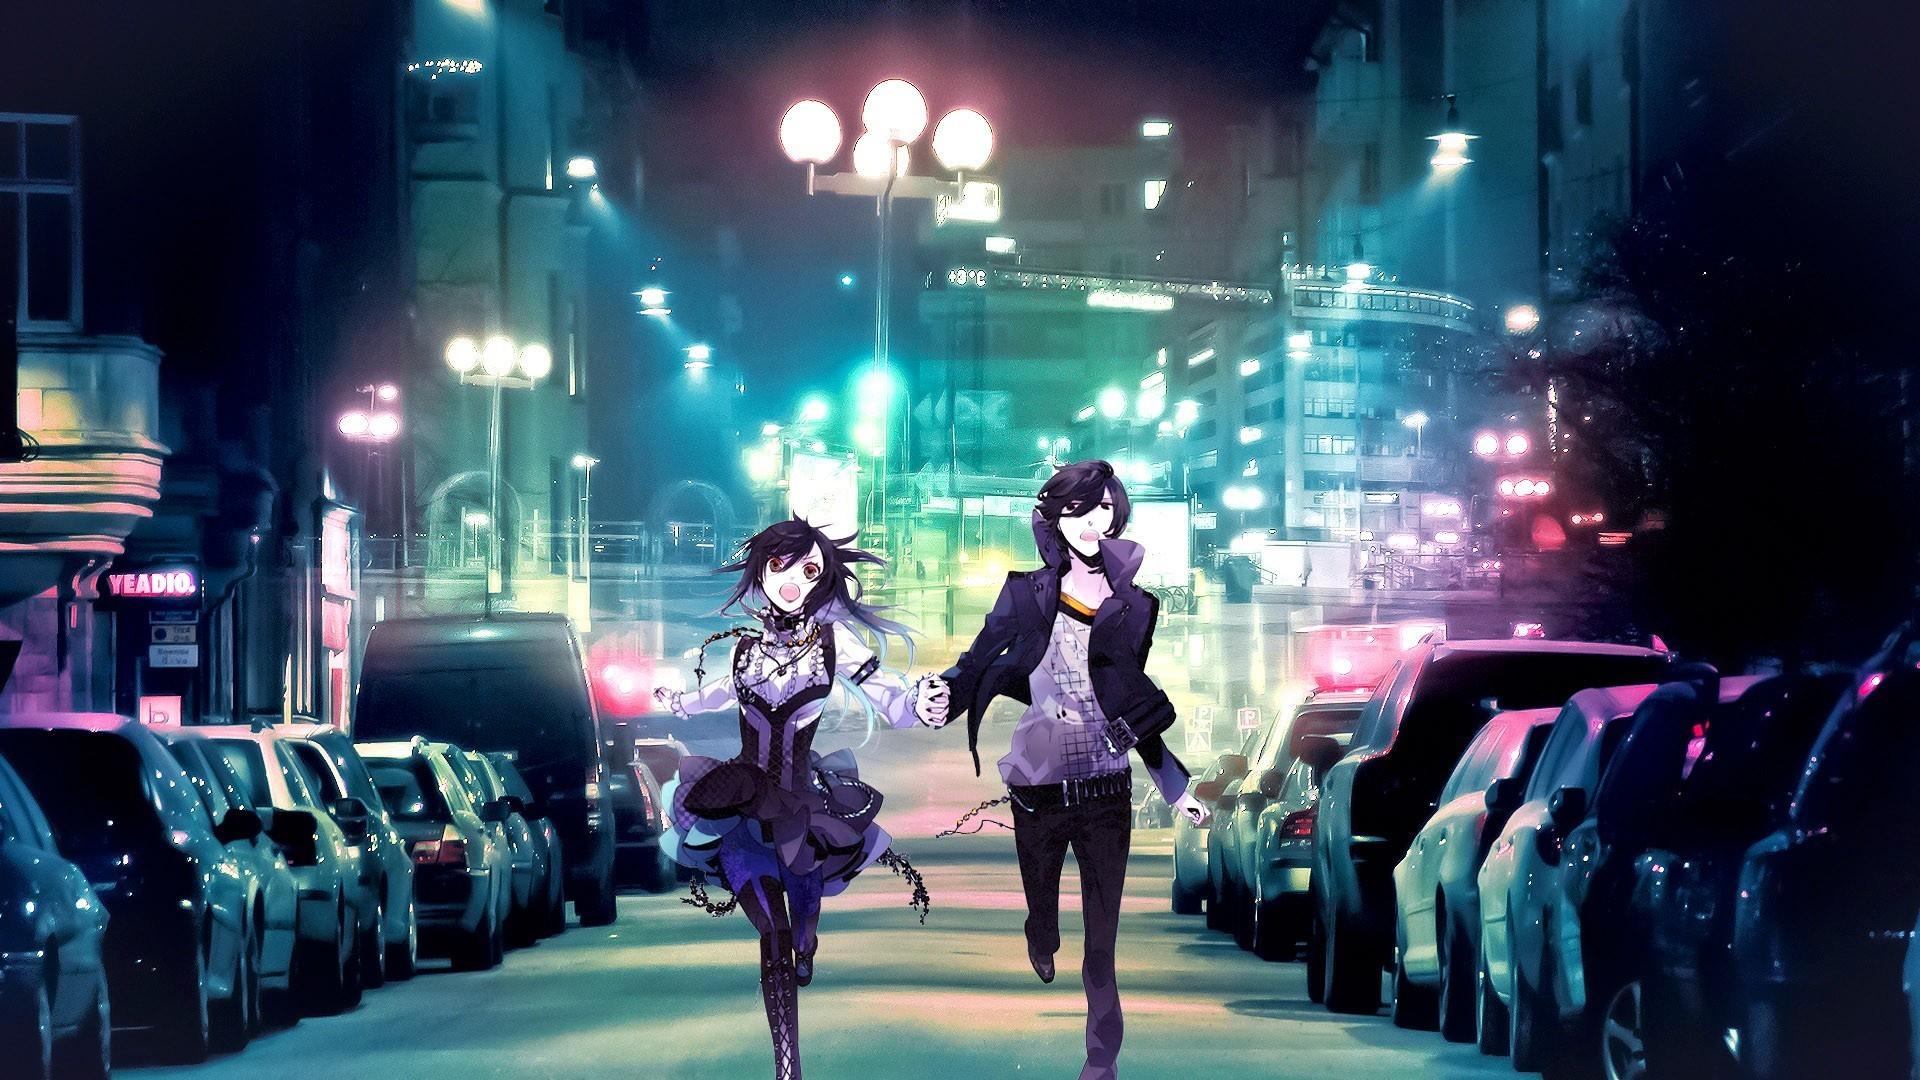 anime desktop wallpaper (72+ images)